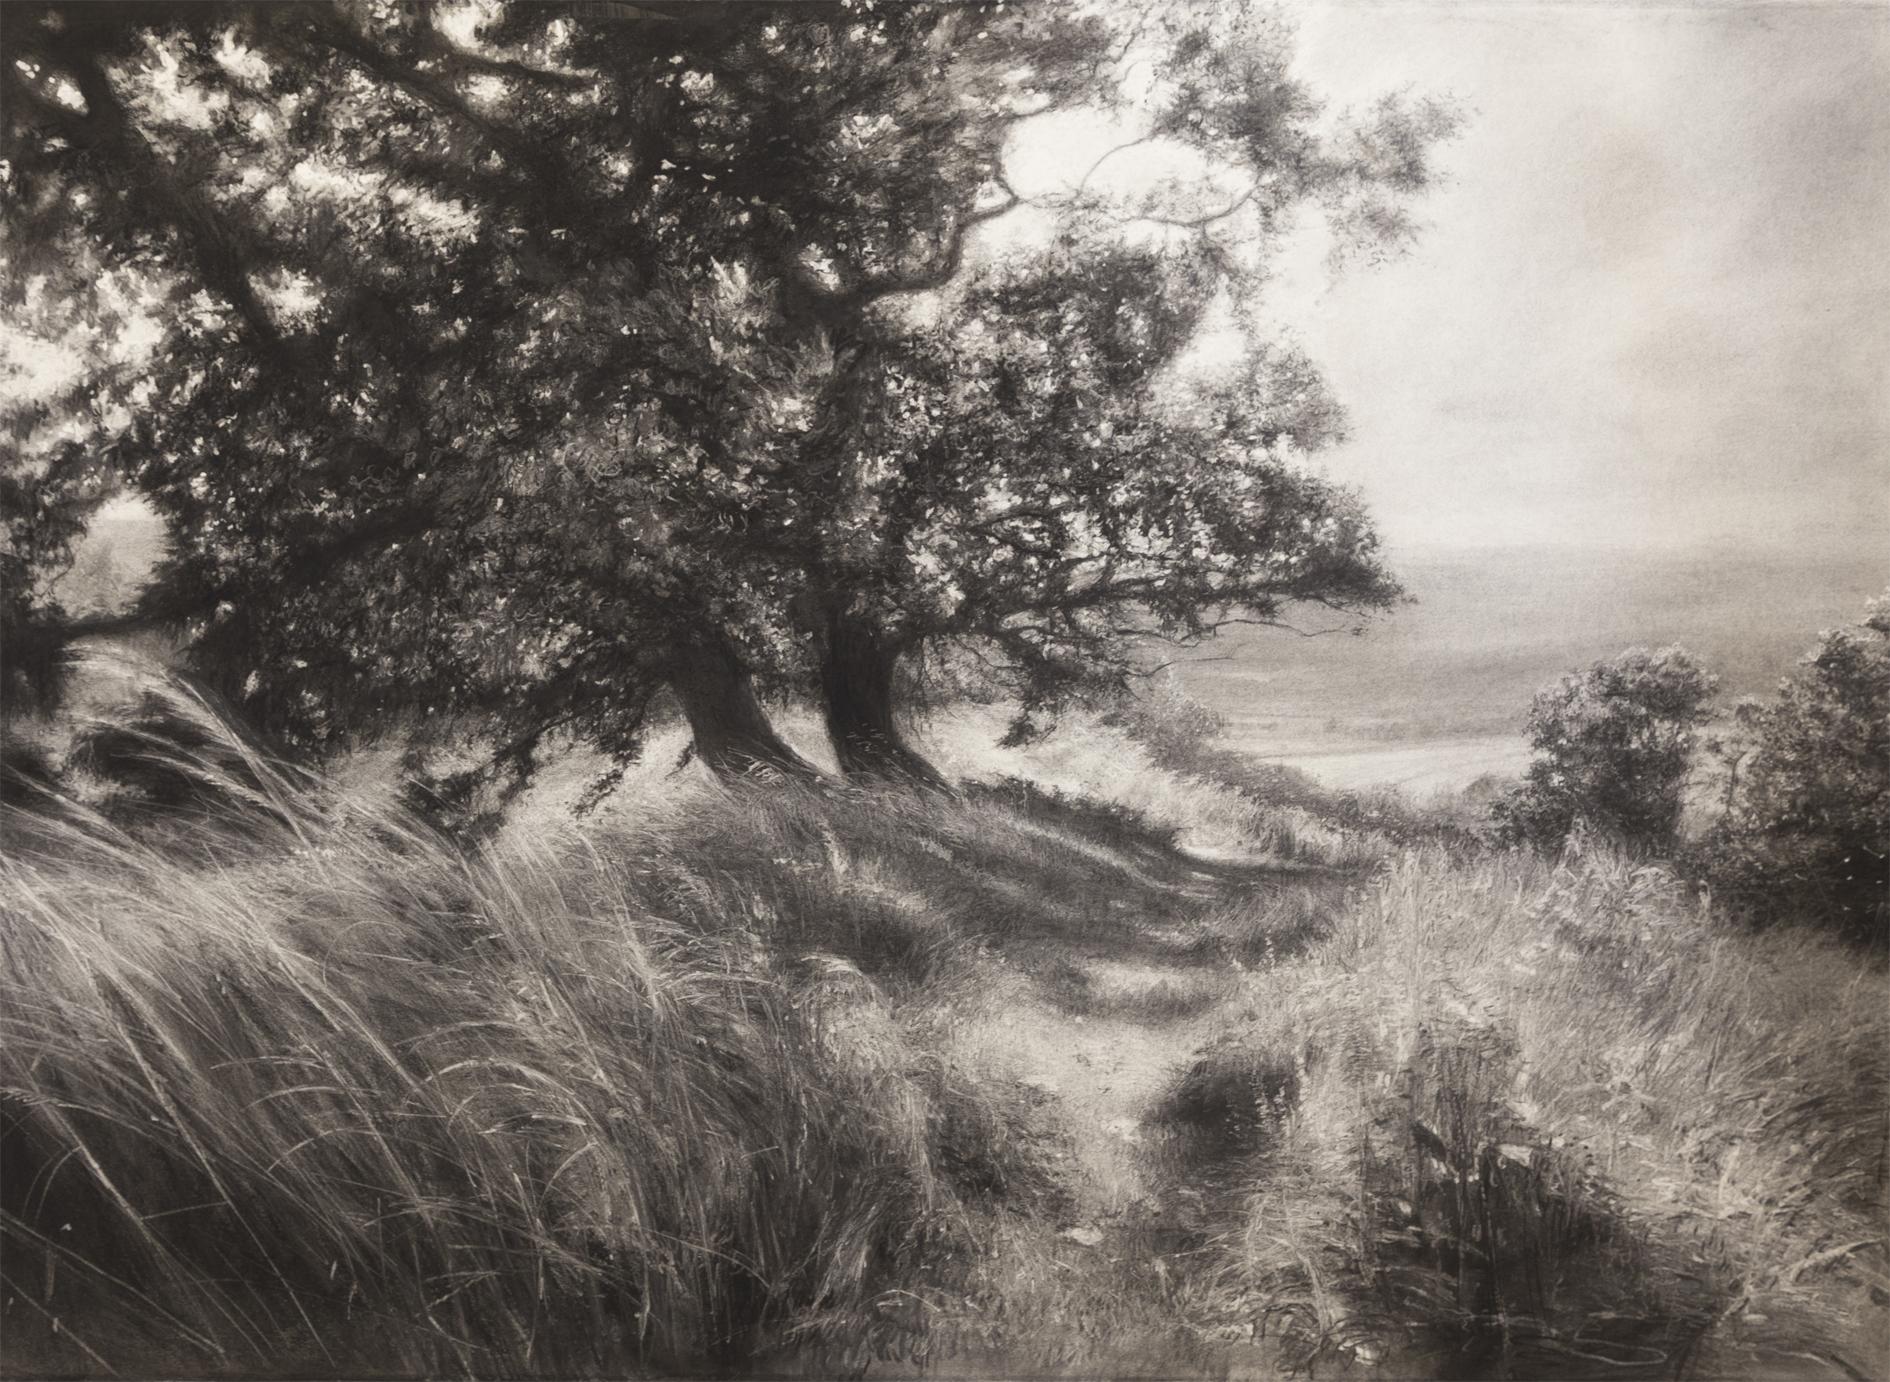 Borderlands, 2017 (charcoal, 85 x 113 cm)